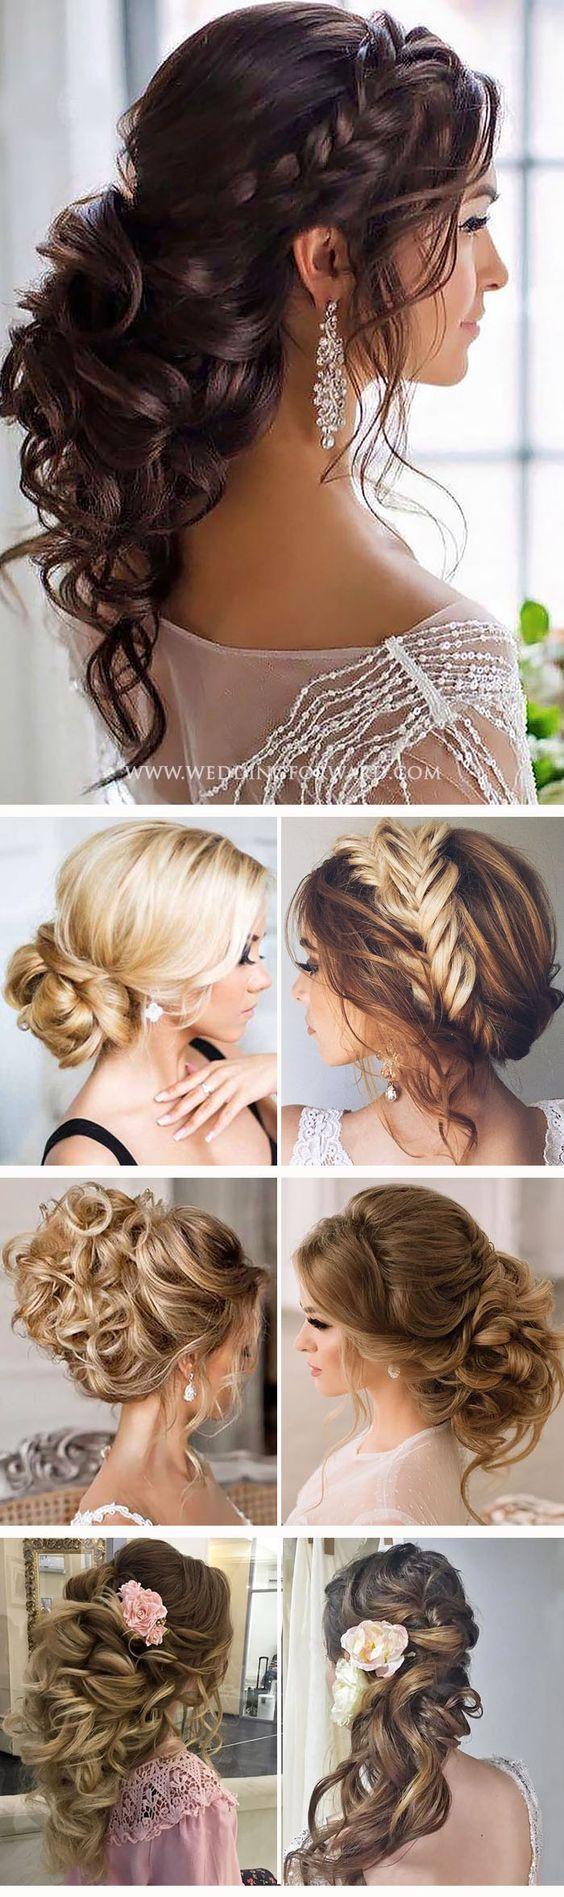 penteados noiva 3